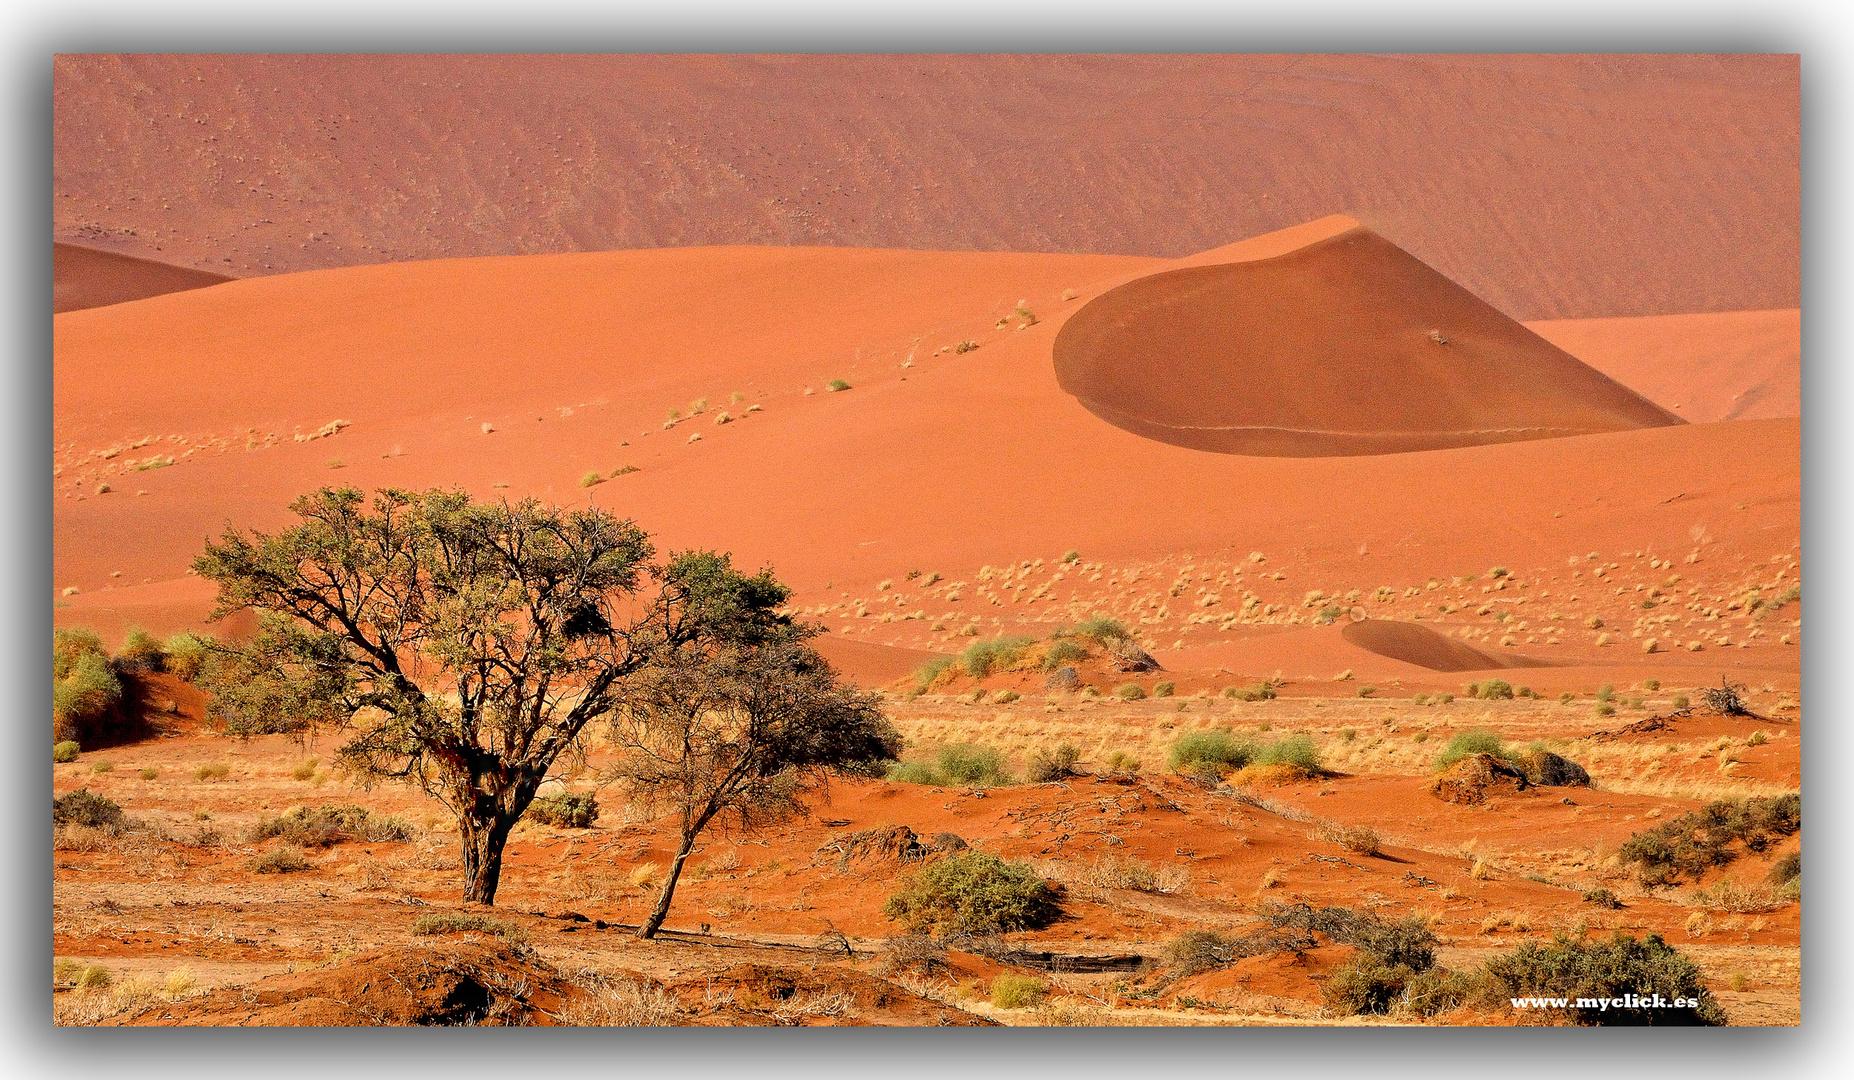 MEMORIAS DE AFRICA-LAS DUNAS DE SOSSUSVLEI -3 -NAMIBIA